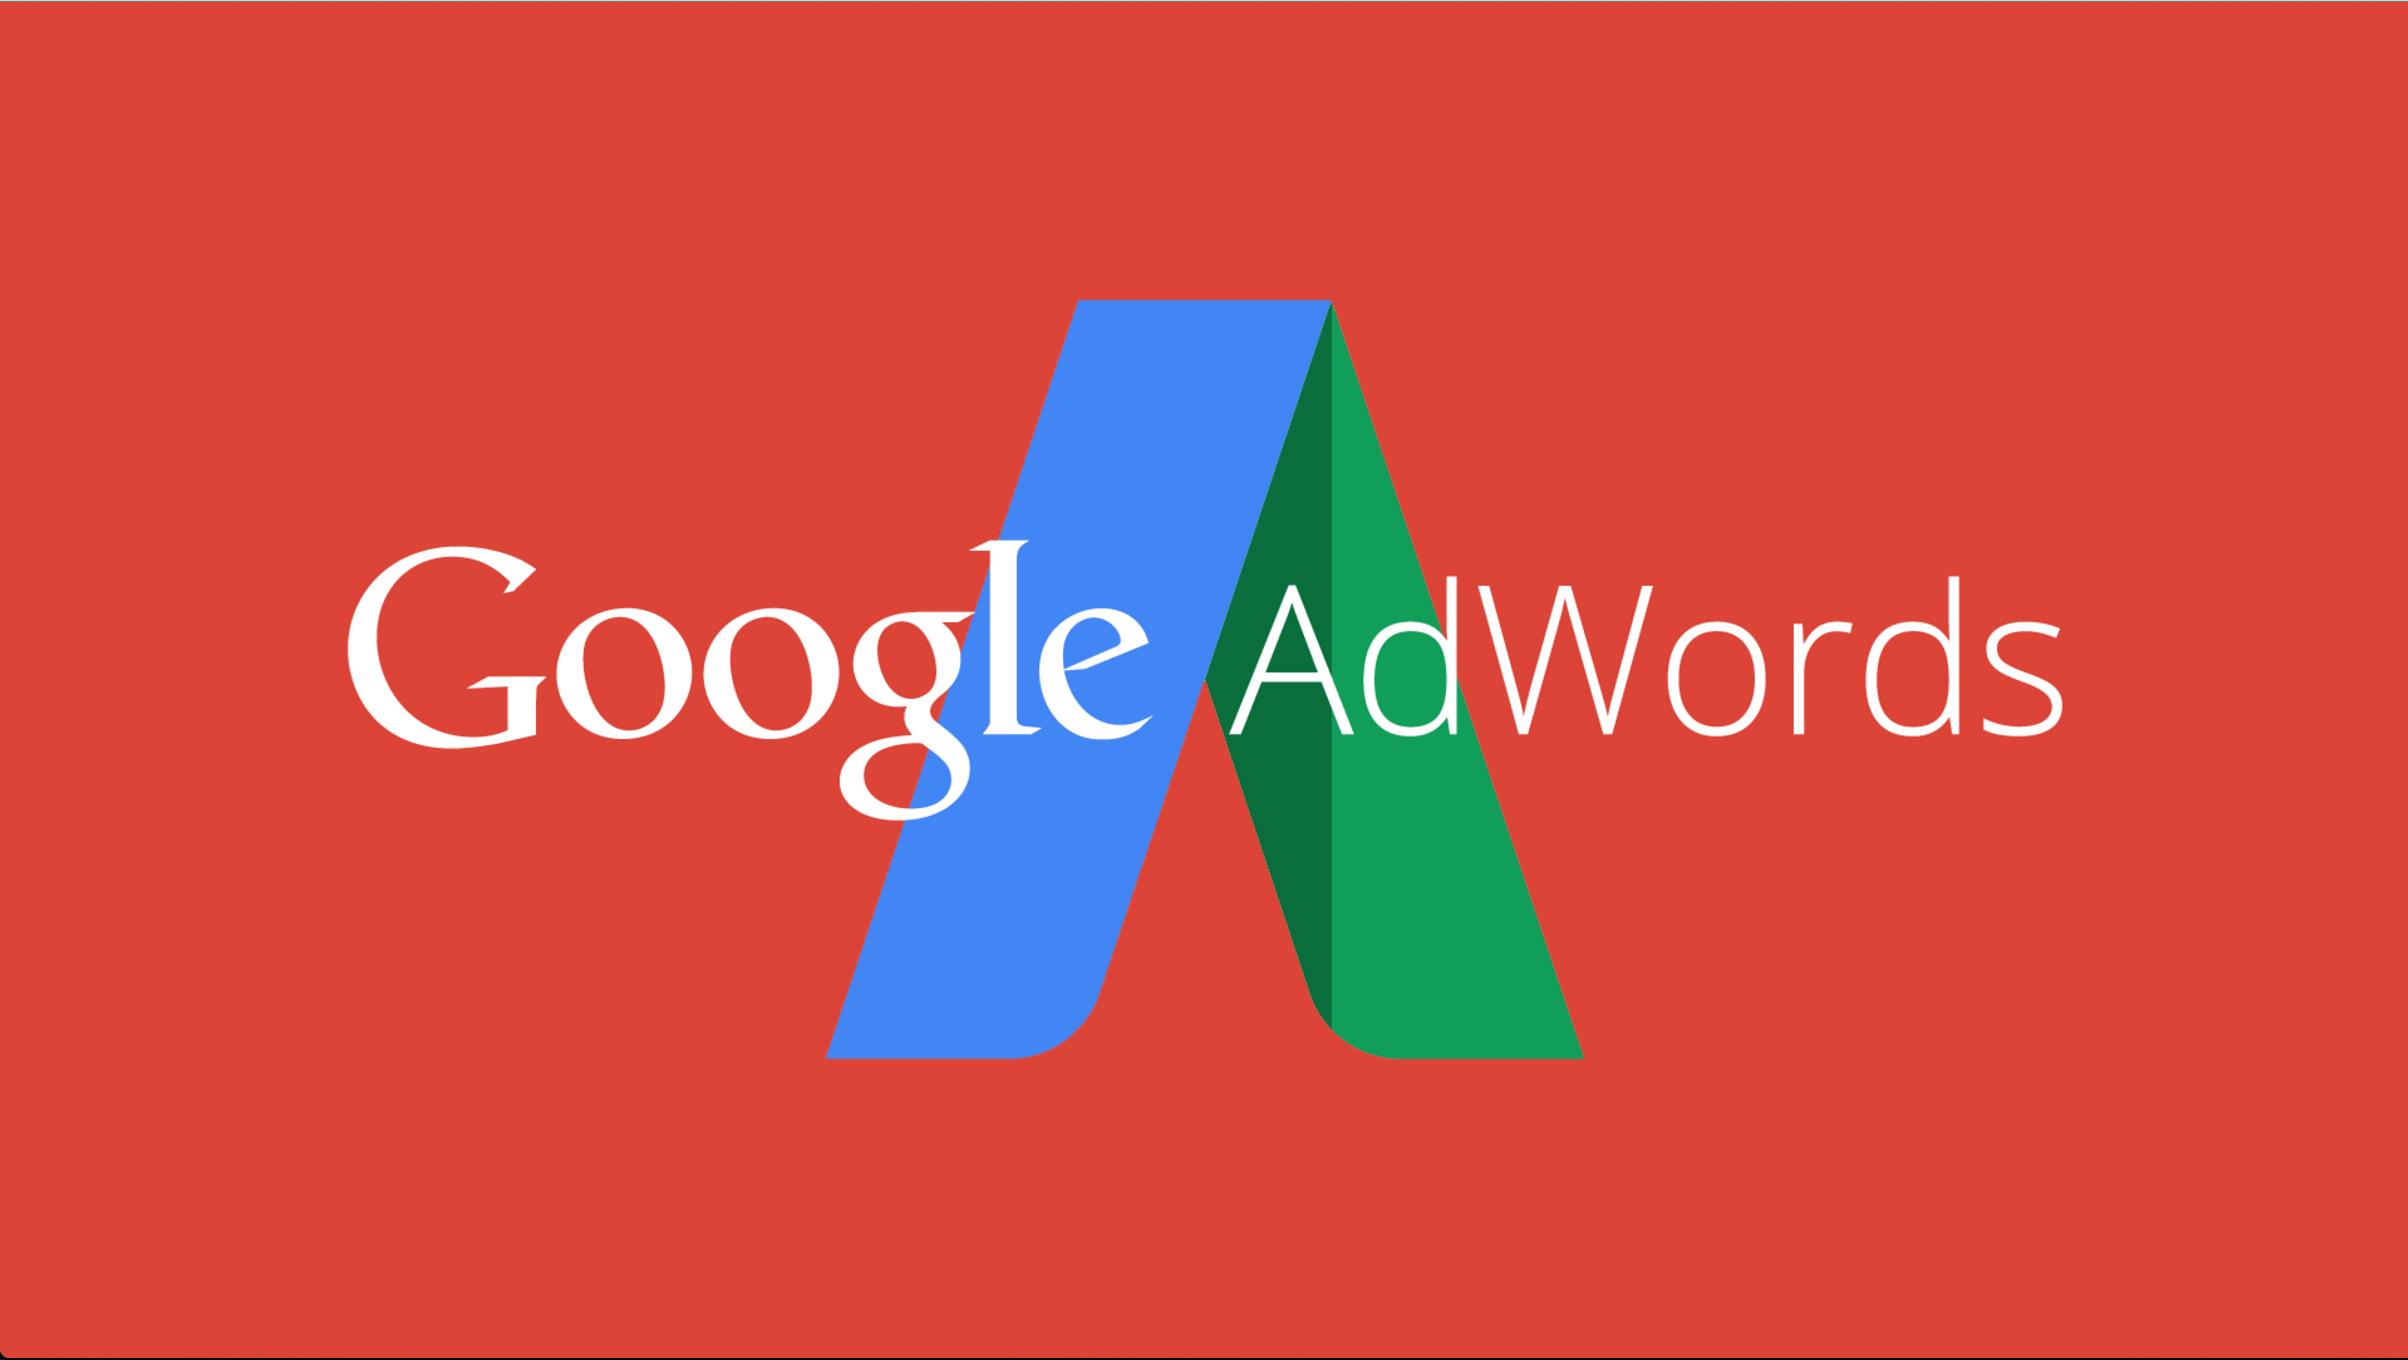 Vamos falar de coisa boa: Google AdWords!